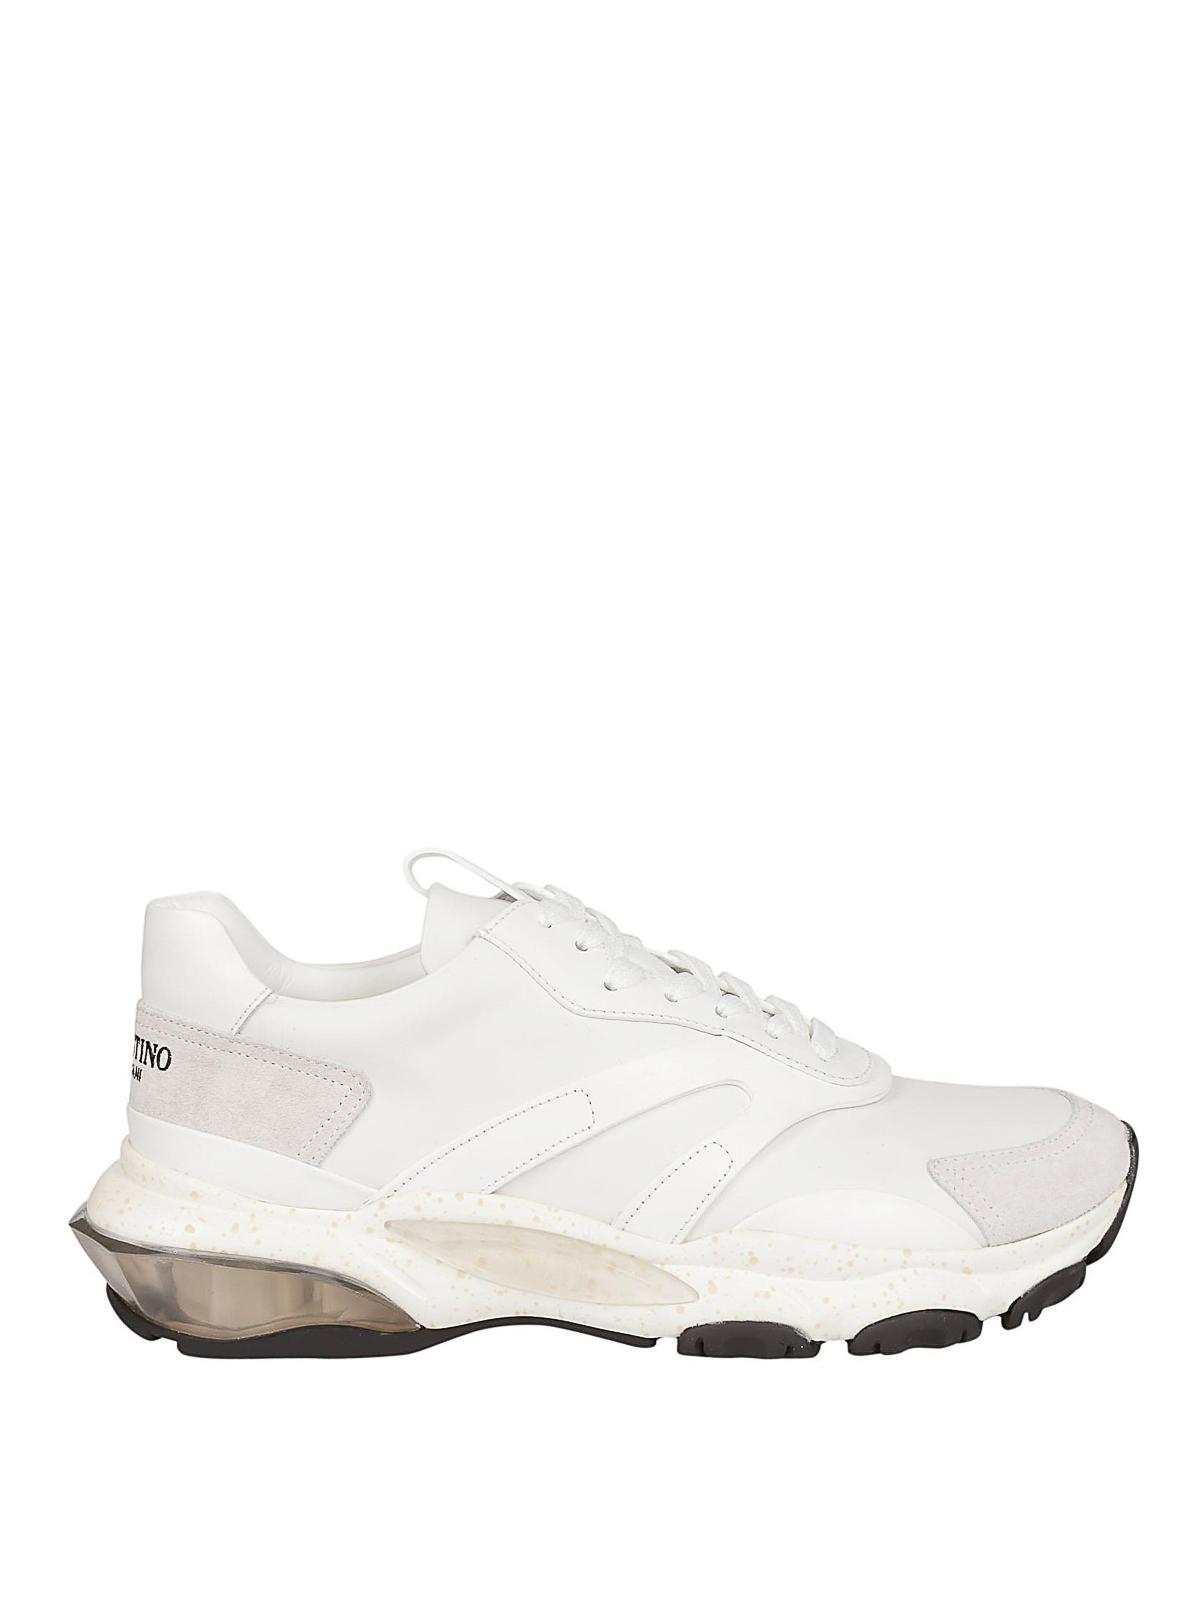 9fae219a832ae Valentino Garavani - Bounce leather sneakers - trainers - QY2S0B05VRN0BO